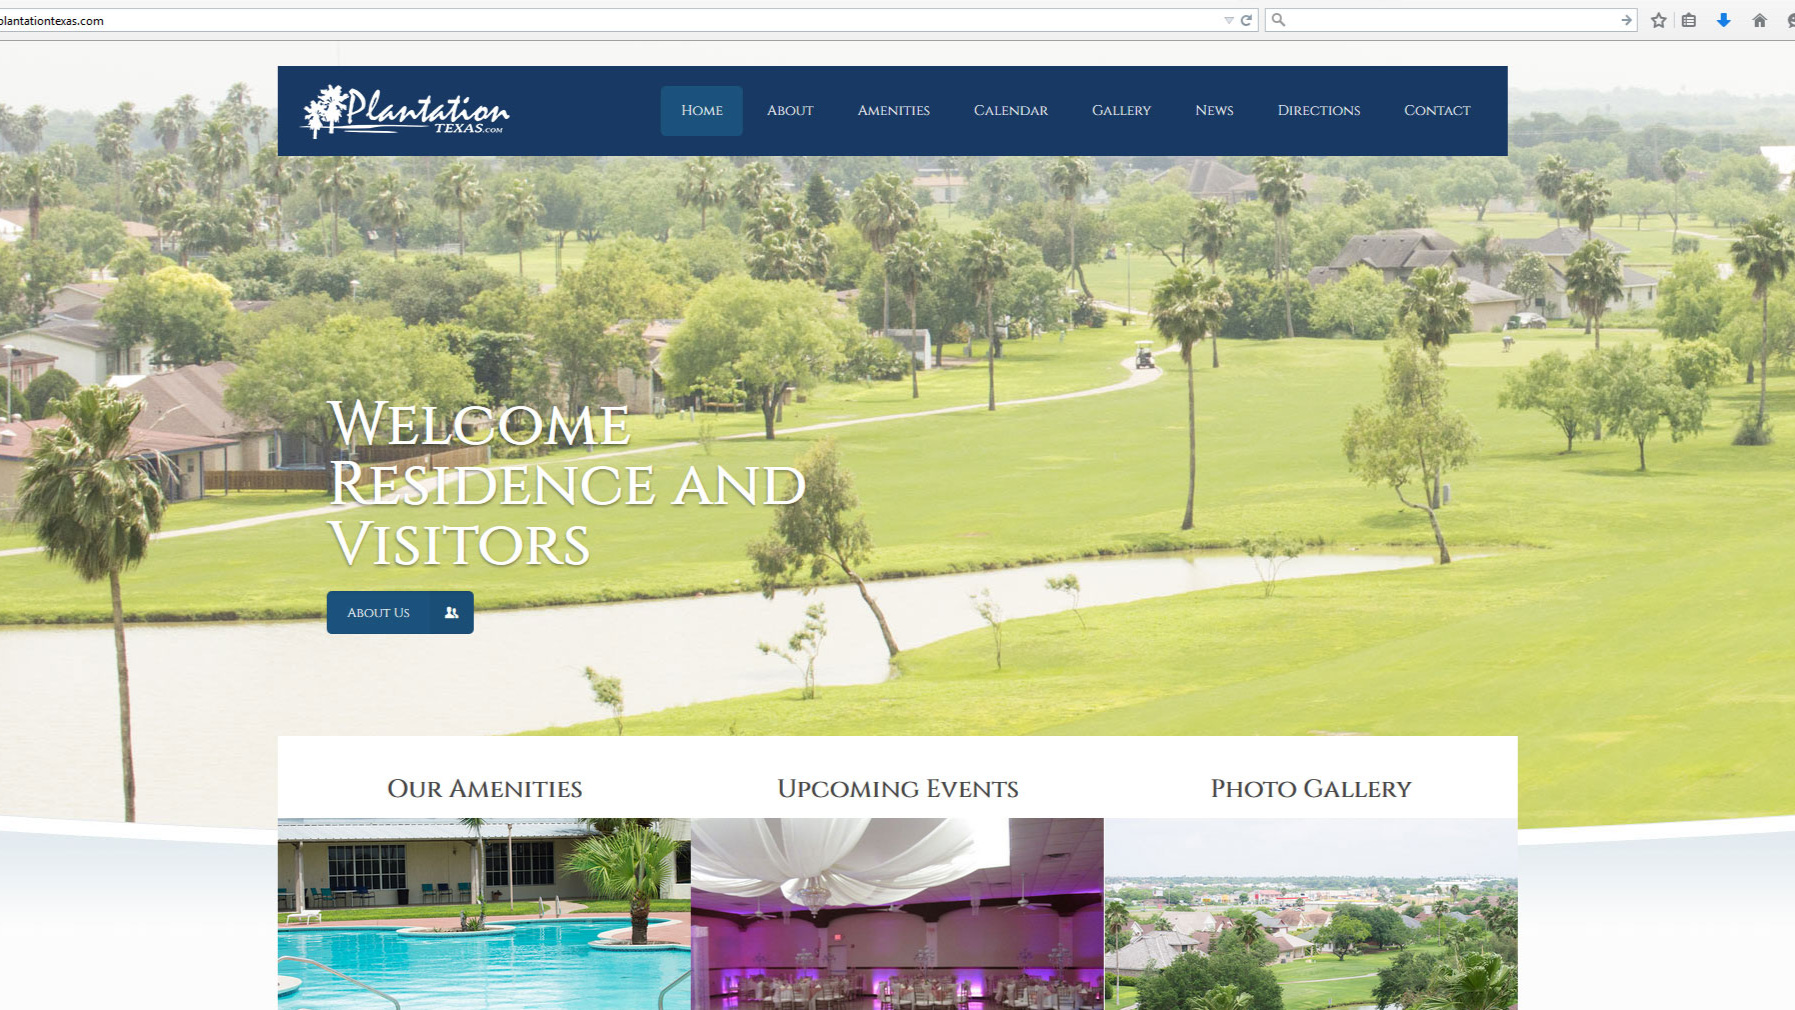 website-design-services-oc19.jpg